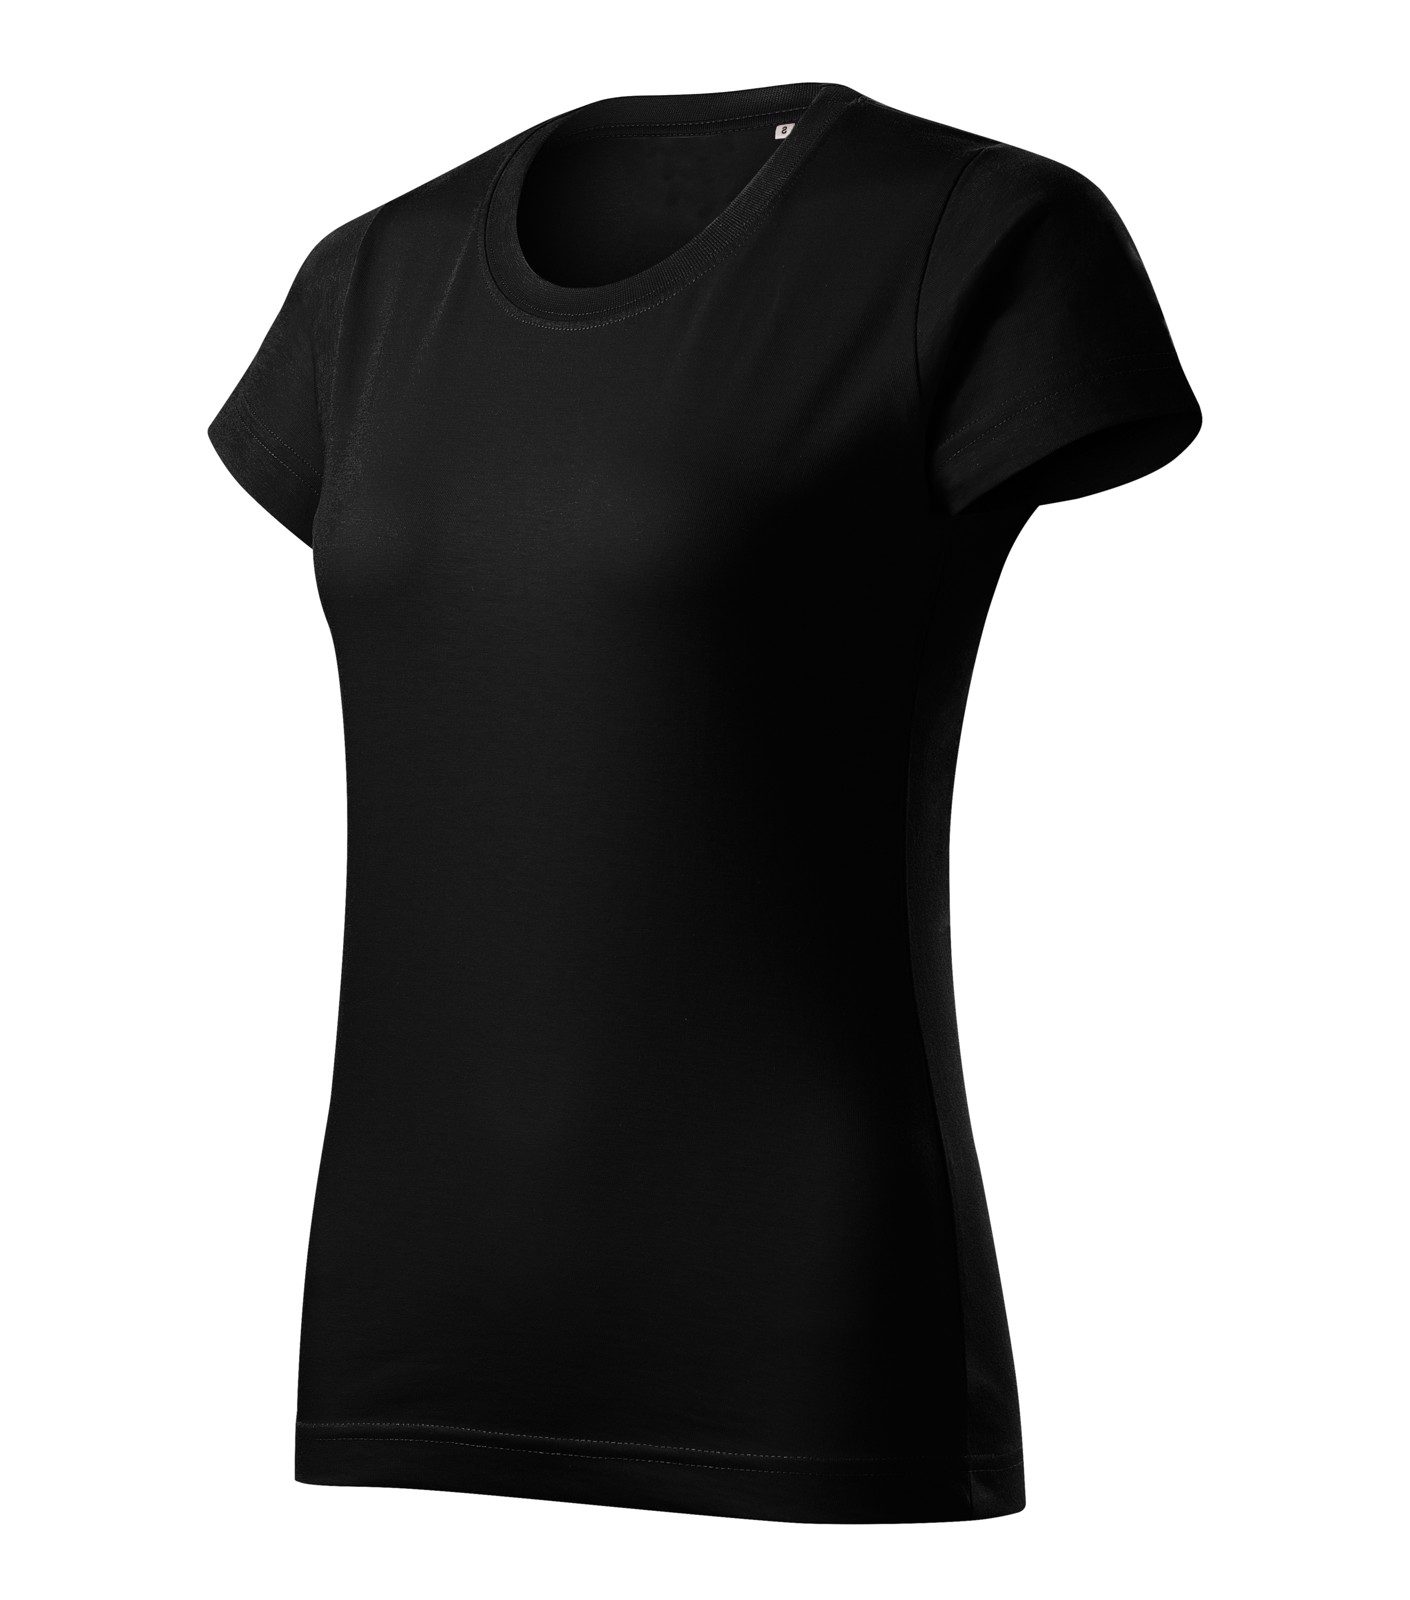 T-shirt women's Malfini Basic Free - Black / M